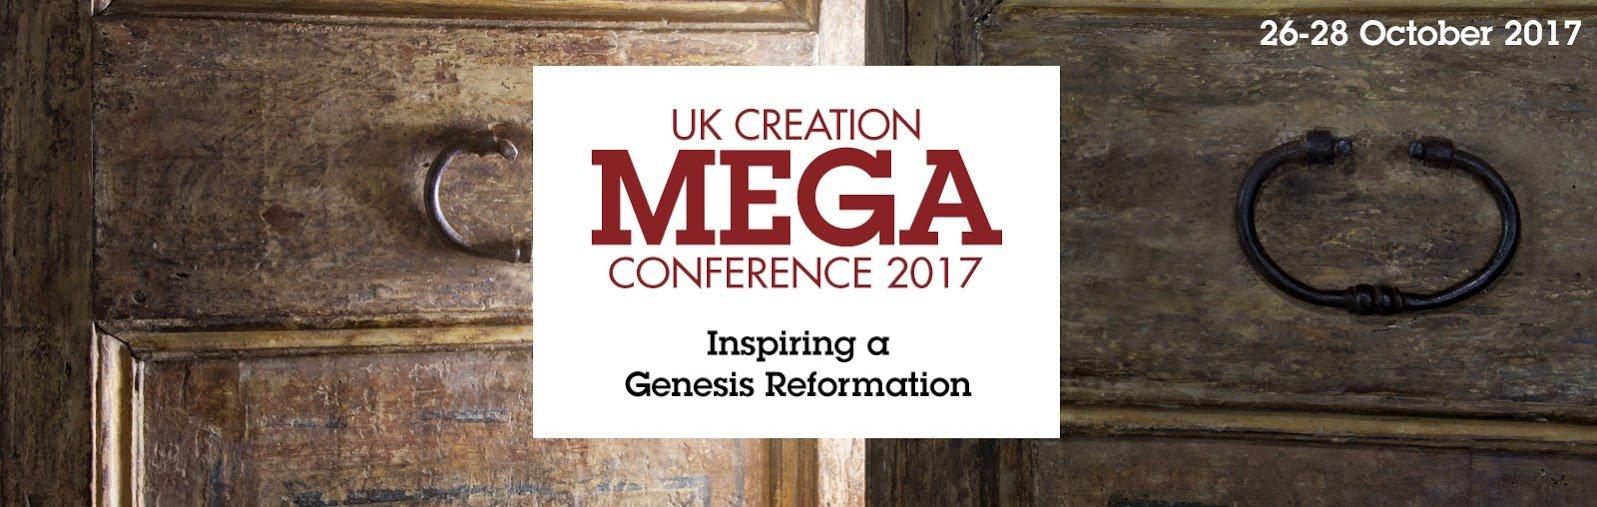 UK Creation Mega Conference 2017